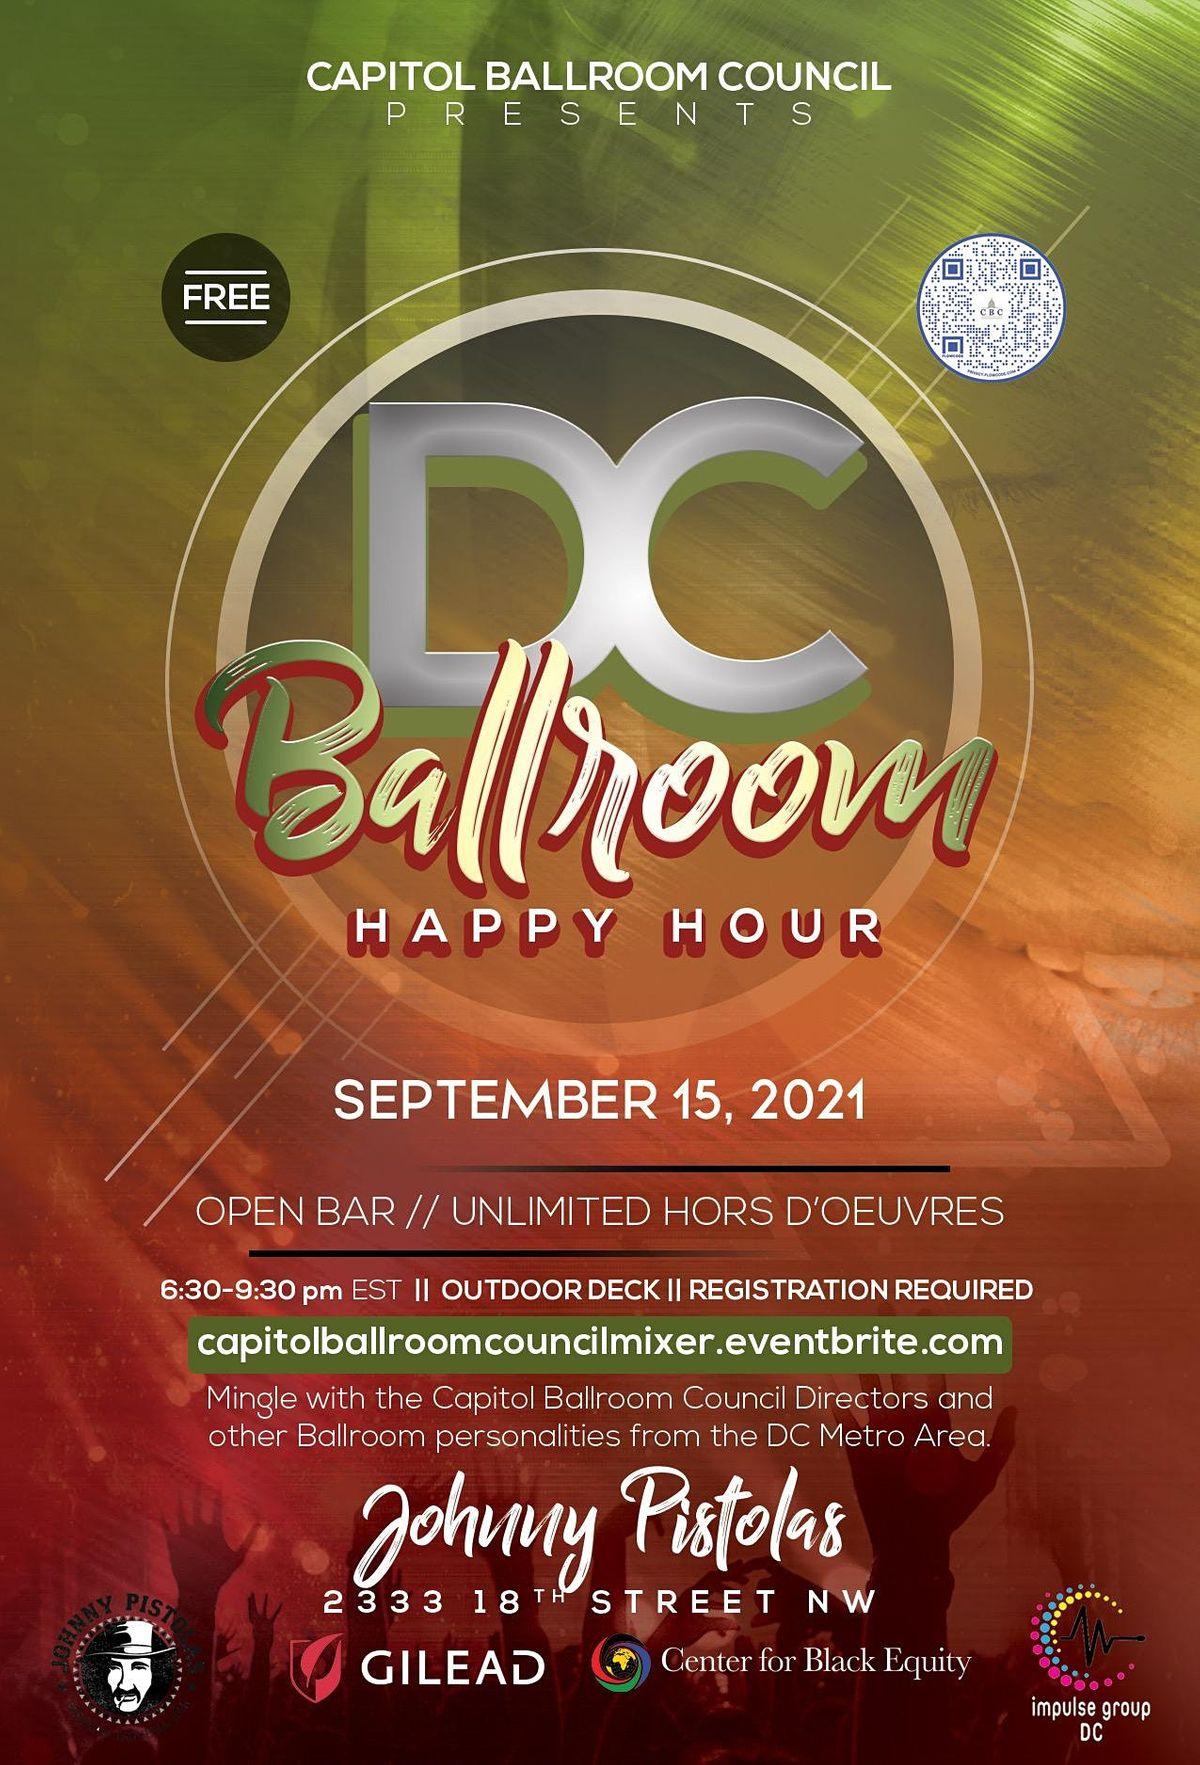 Capitol Ballroom Council Meet & Greet Mixer